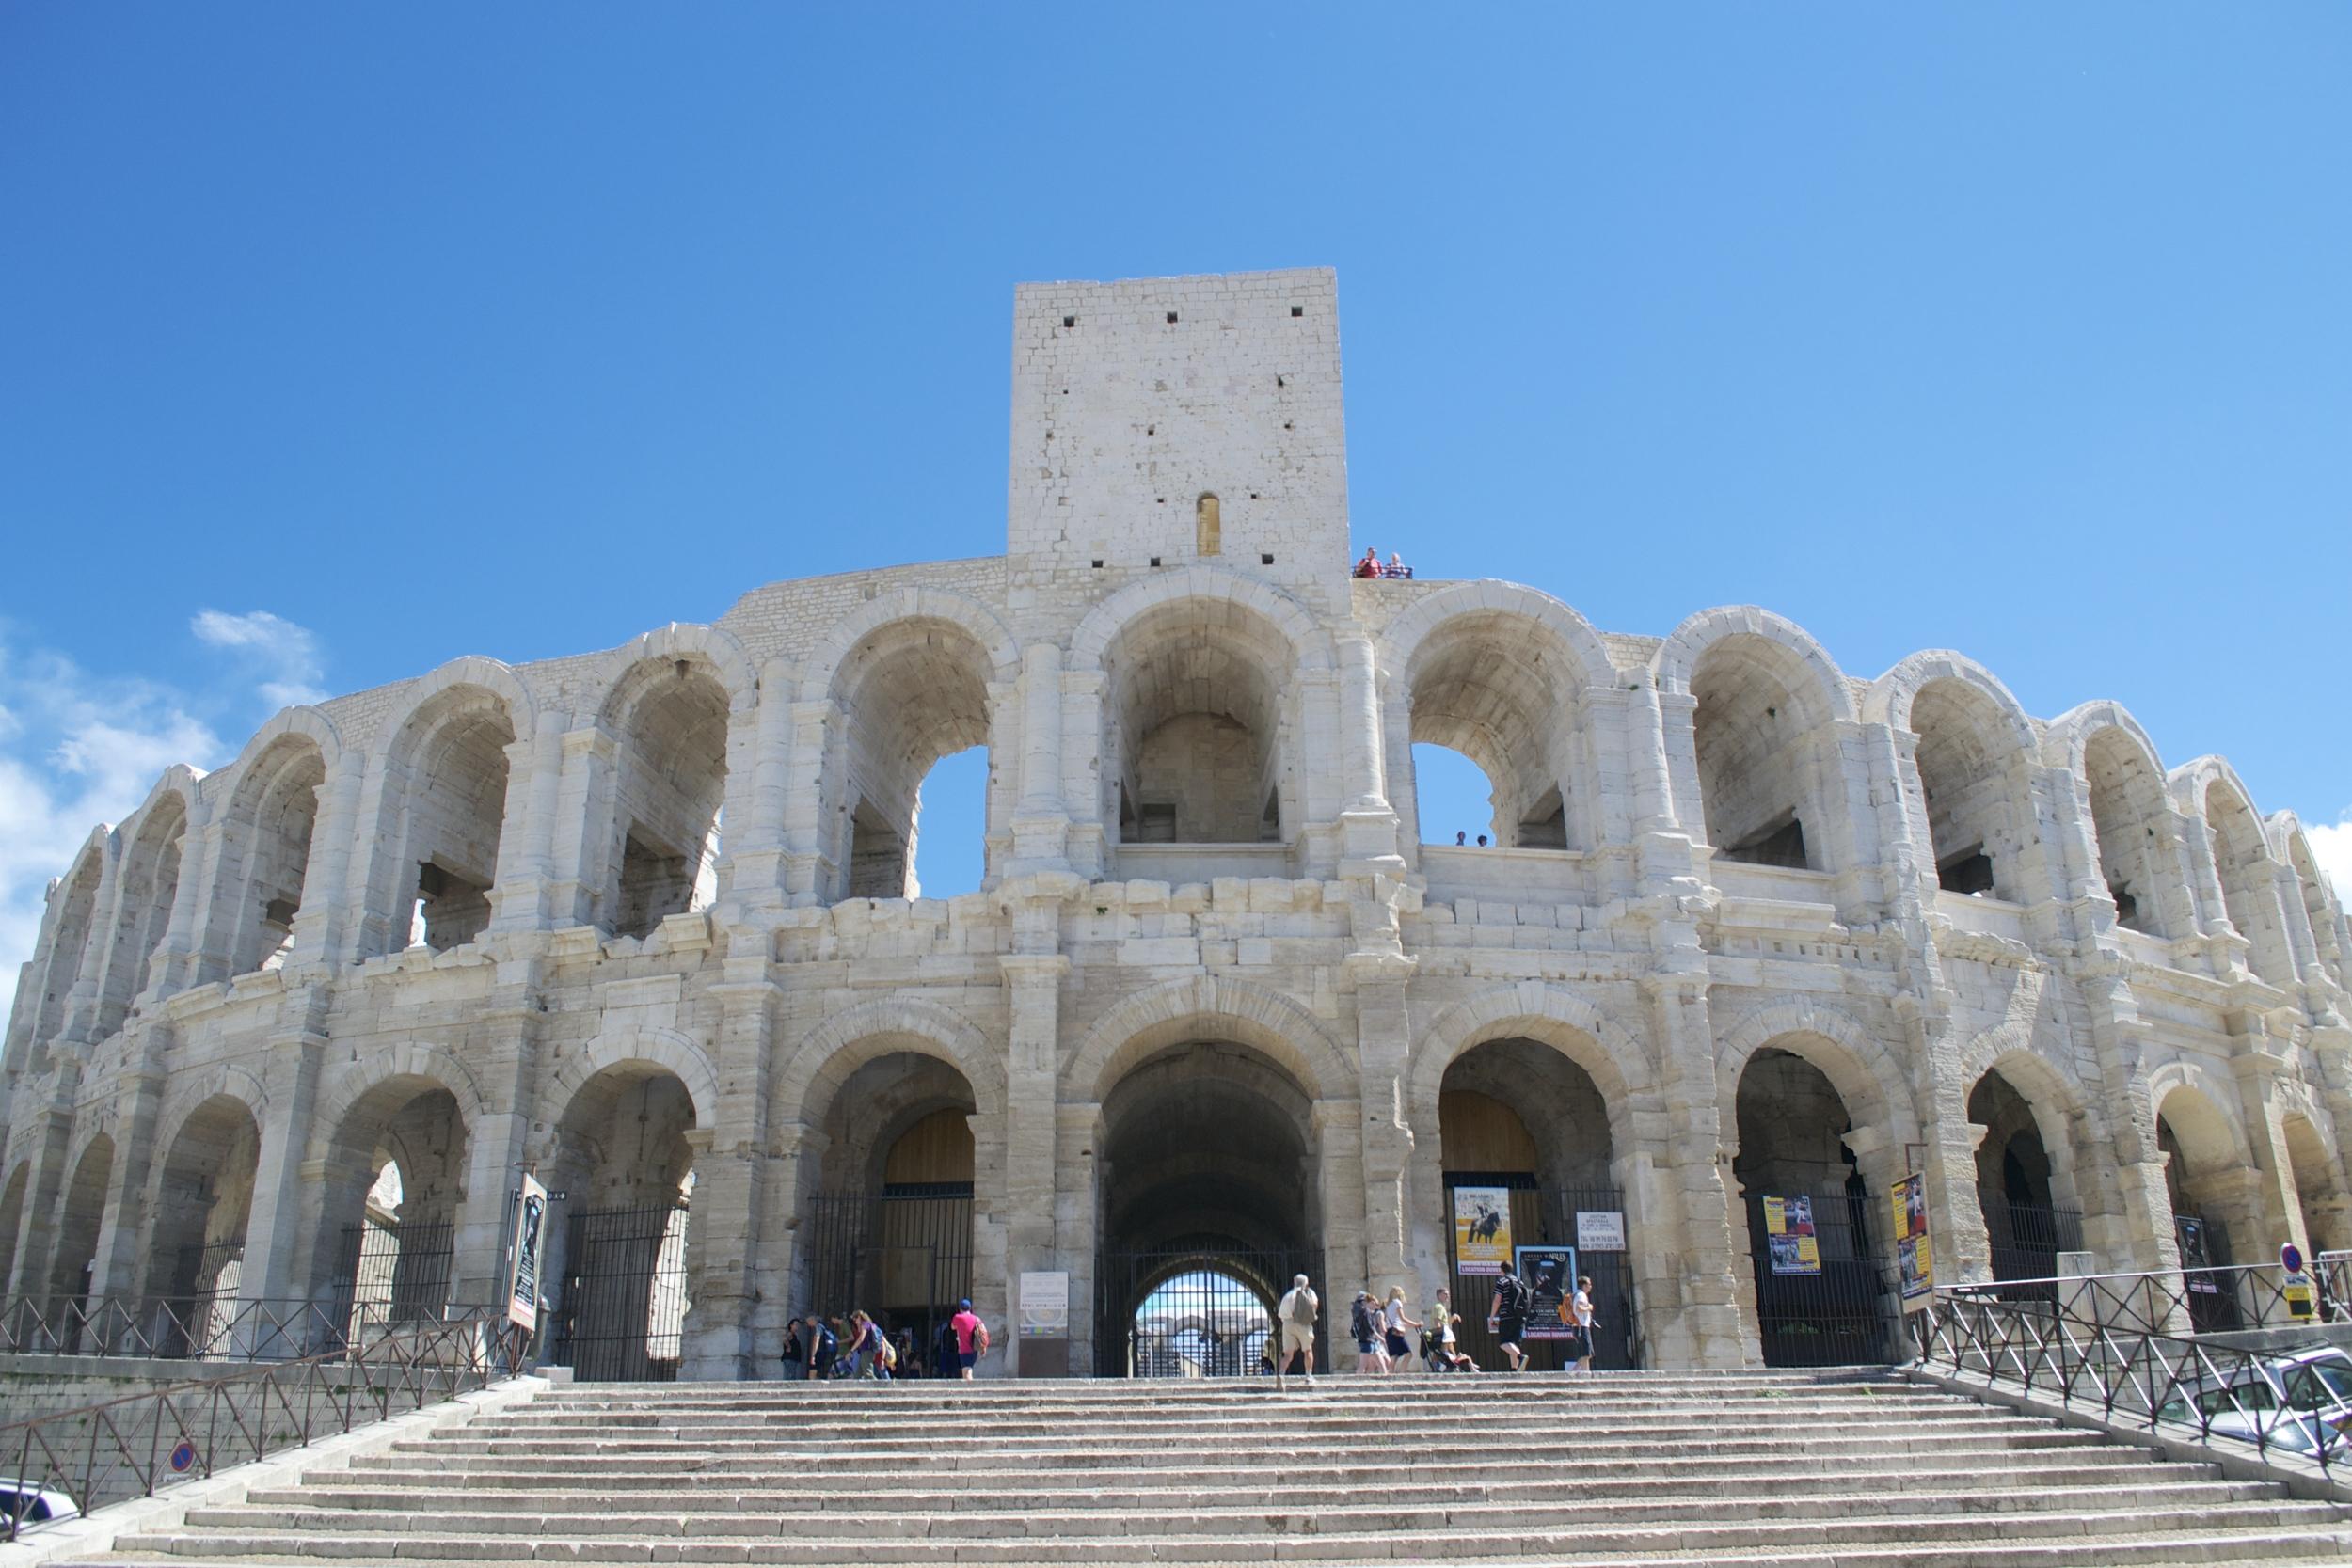 The Roman Amphitheater in Arles.